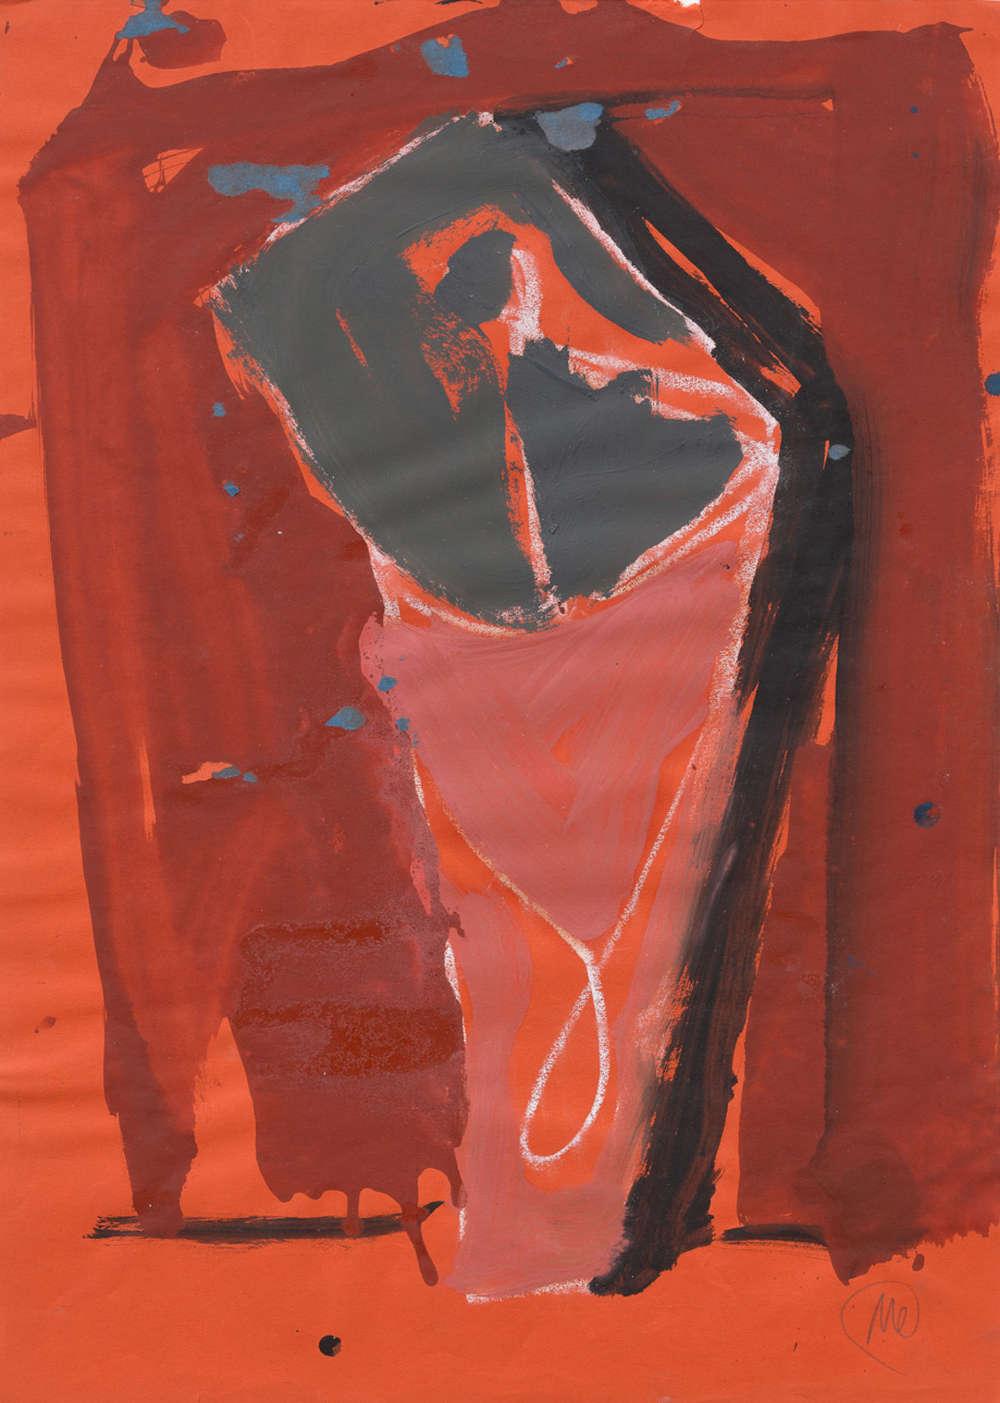 Markus Lüpertz, Untitled, 1980. Oil, acrylic on paper 27 1/2 x 19 3/4 inches 70 x 50 cm